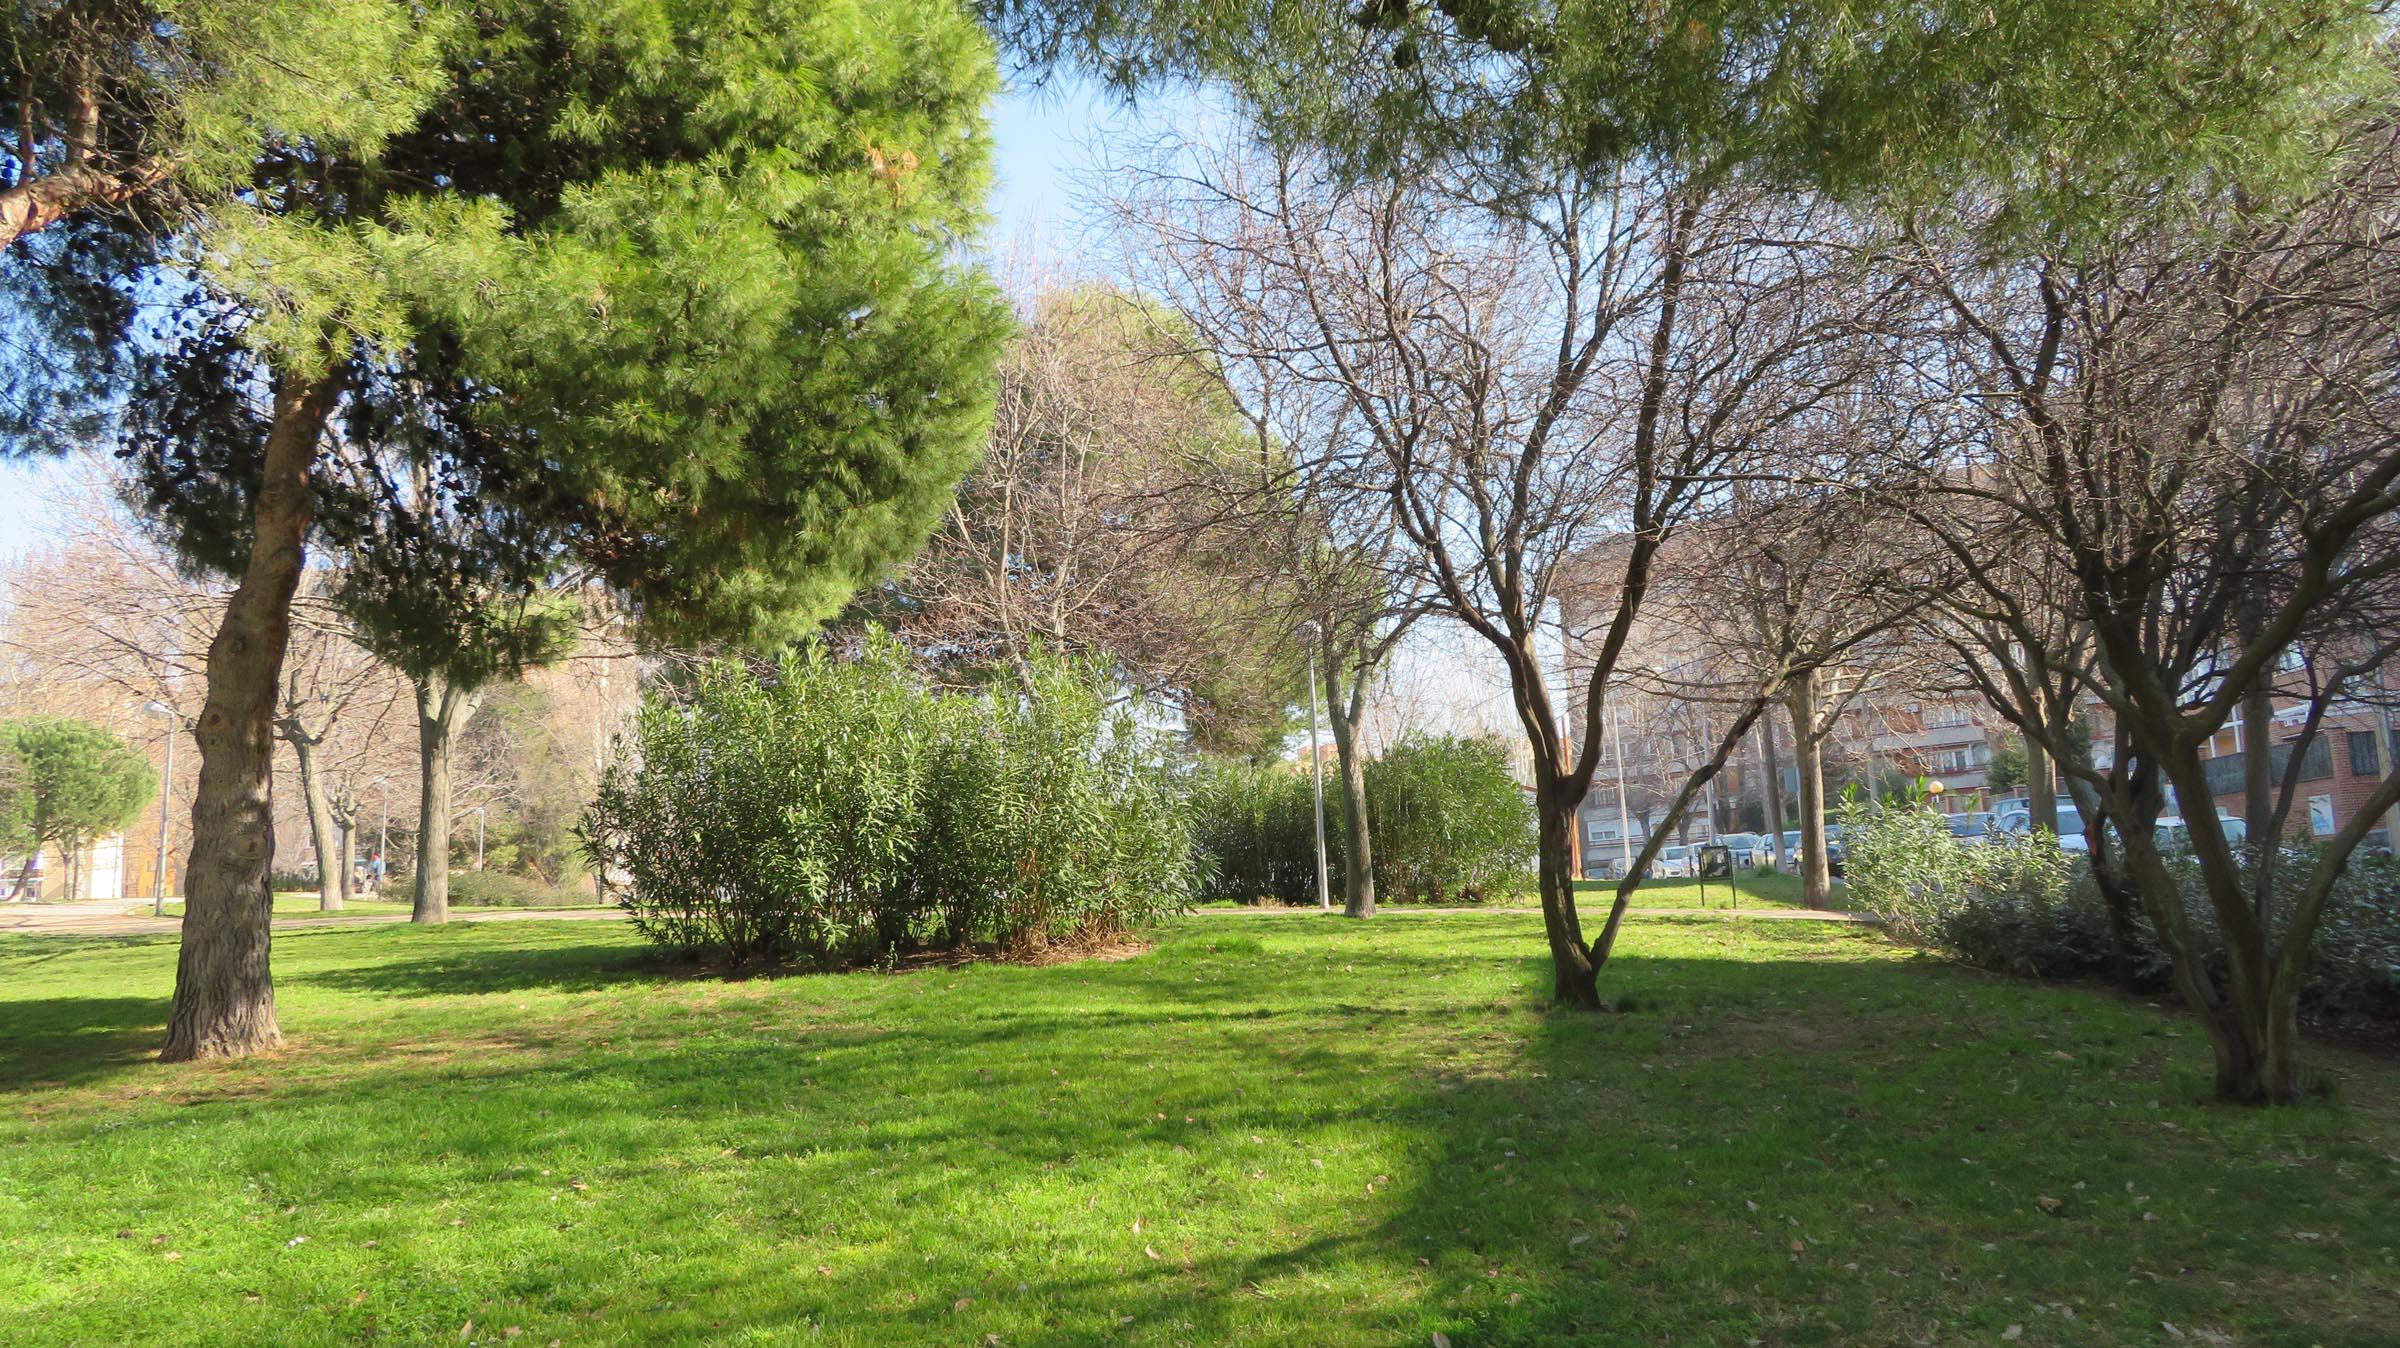 Parque del butron